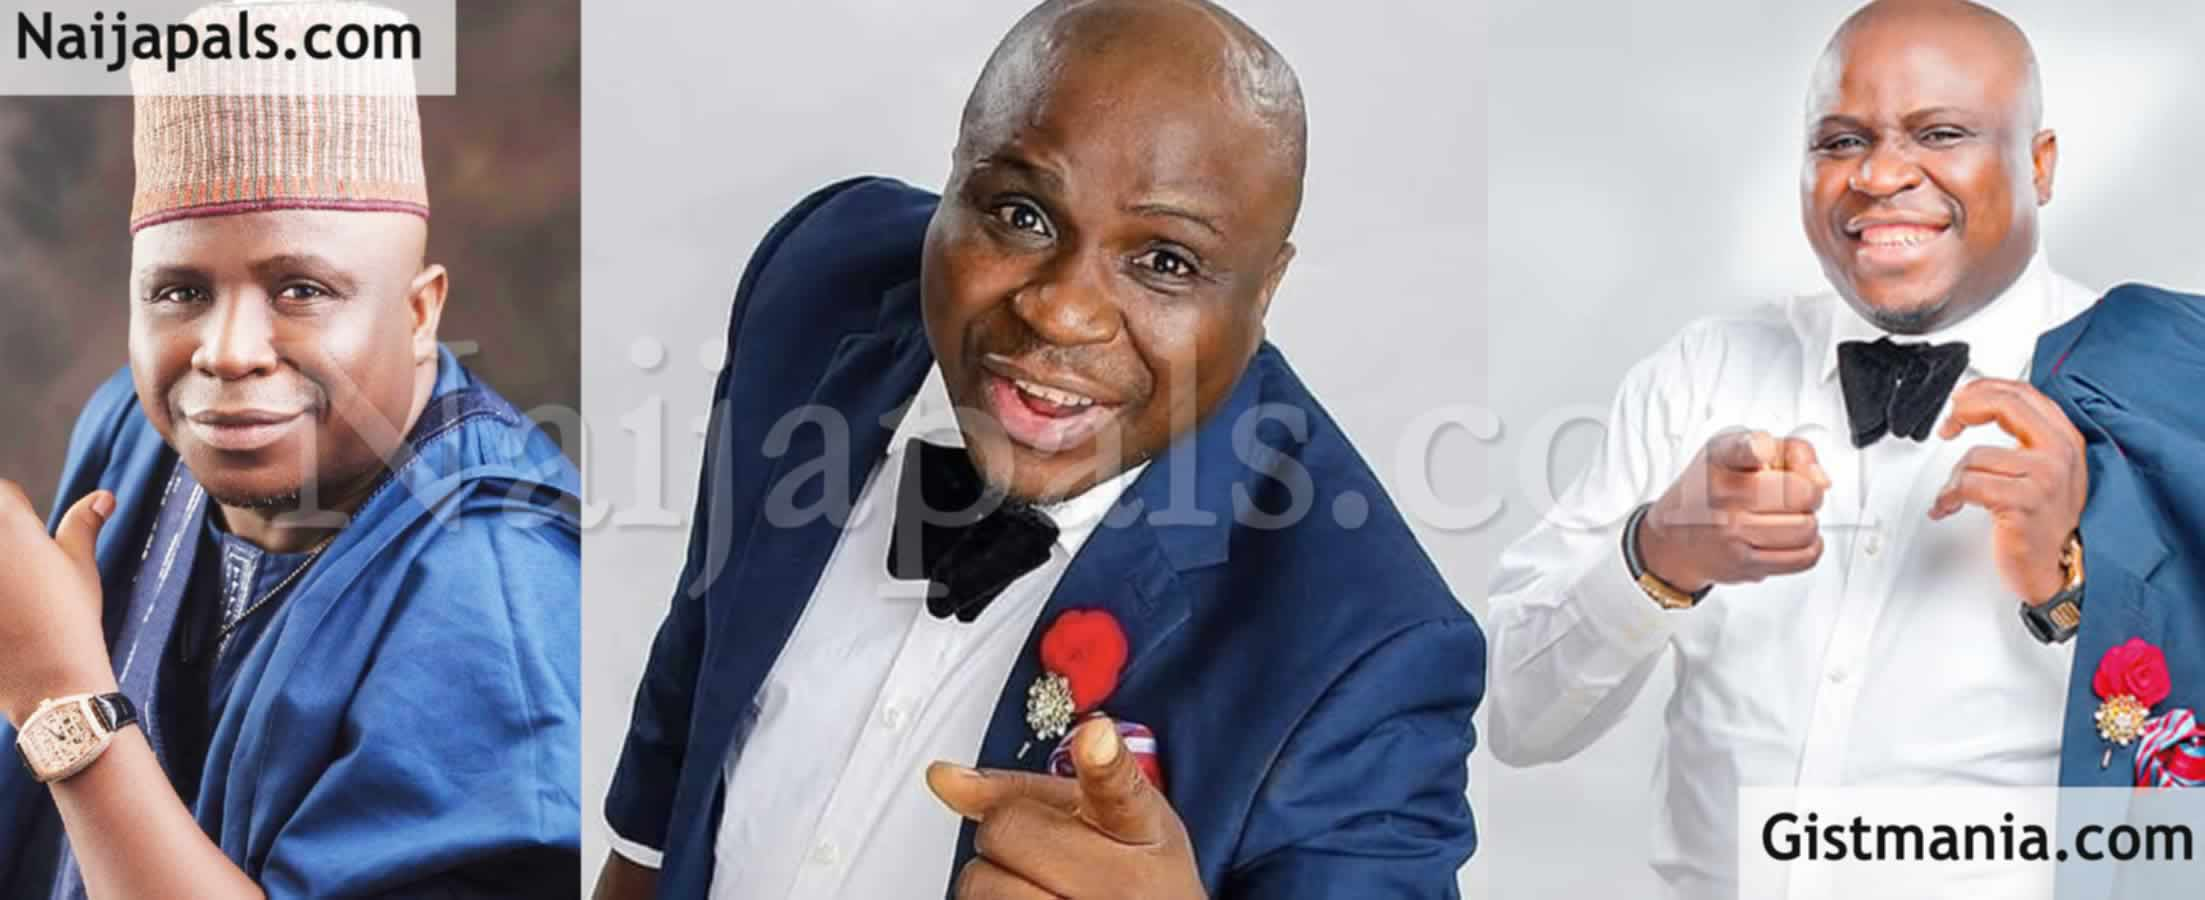 "<img alt='.' class='lazyload' data-src='https://img.gistmania.com/emot/thumbs_up.gif' /> <b>""Why I Don't Show Off My Family On Social Media""</b> – Ace Comedian, Gbenga Adeyinka Speaks"